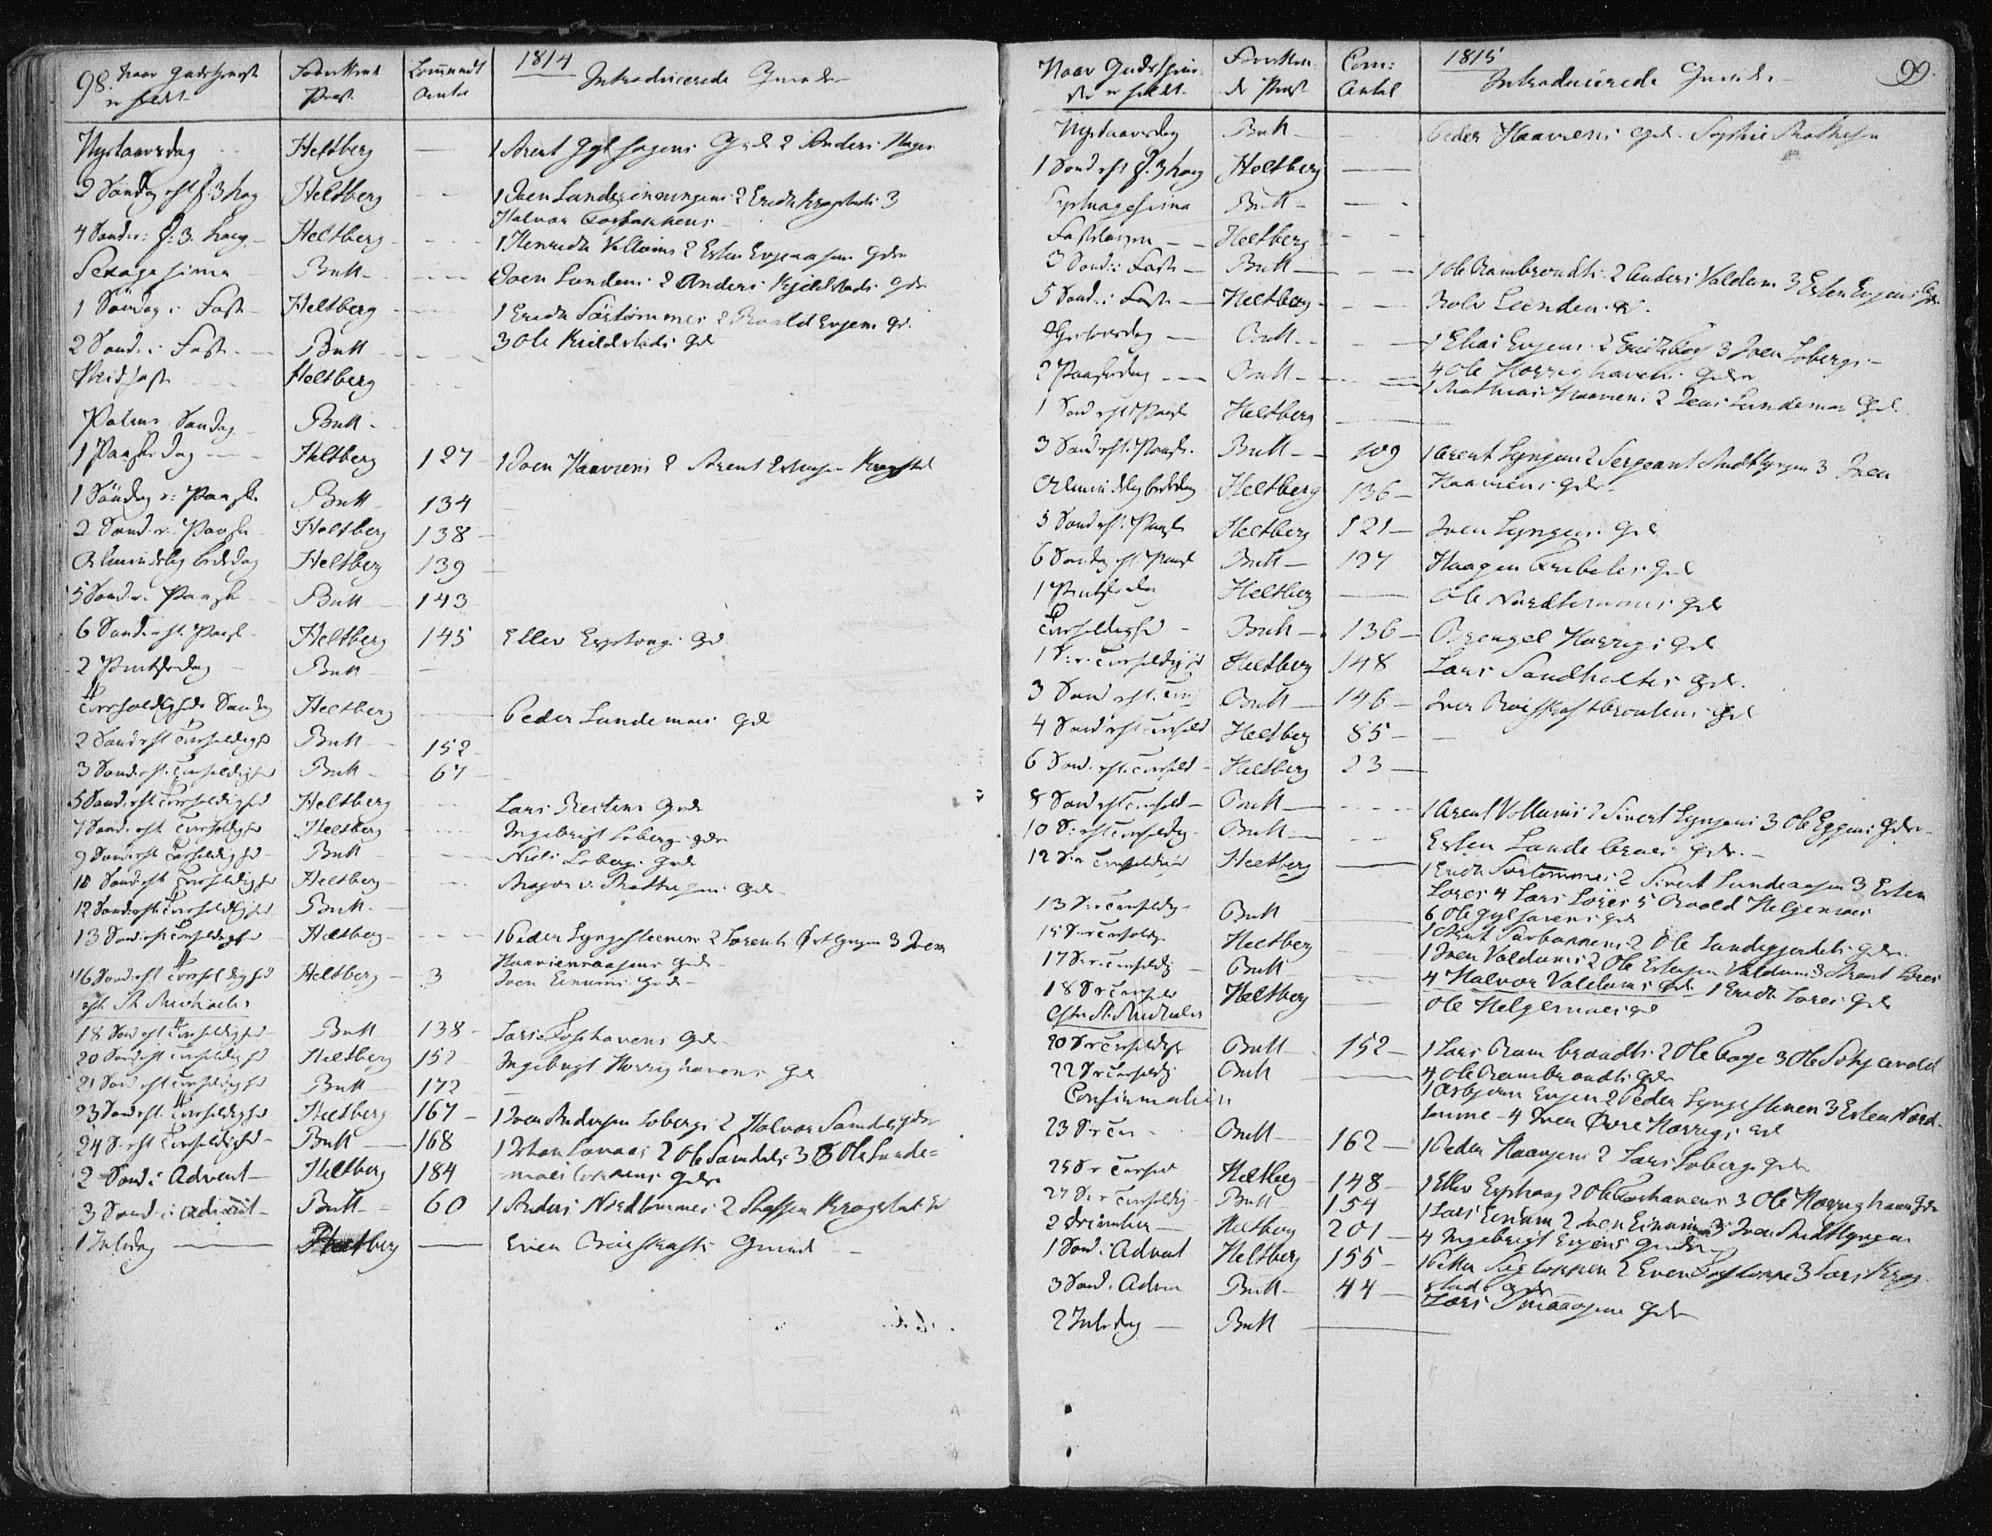 SAT, Ministerialprotokoller, klokkerbøker og fødselsregistre - Sør-Trøndelag, 687/L0993: Parish register (official) no. 687A03 /2, 1788-1815, p. 98-99